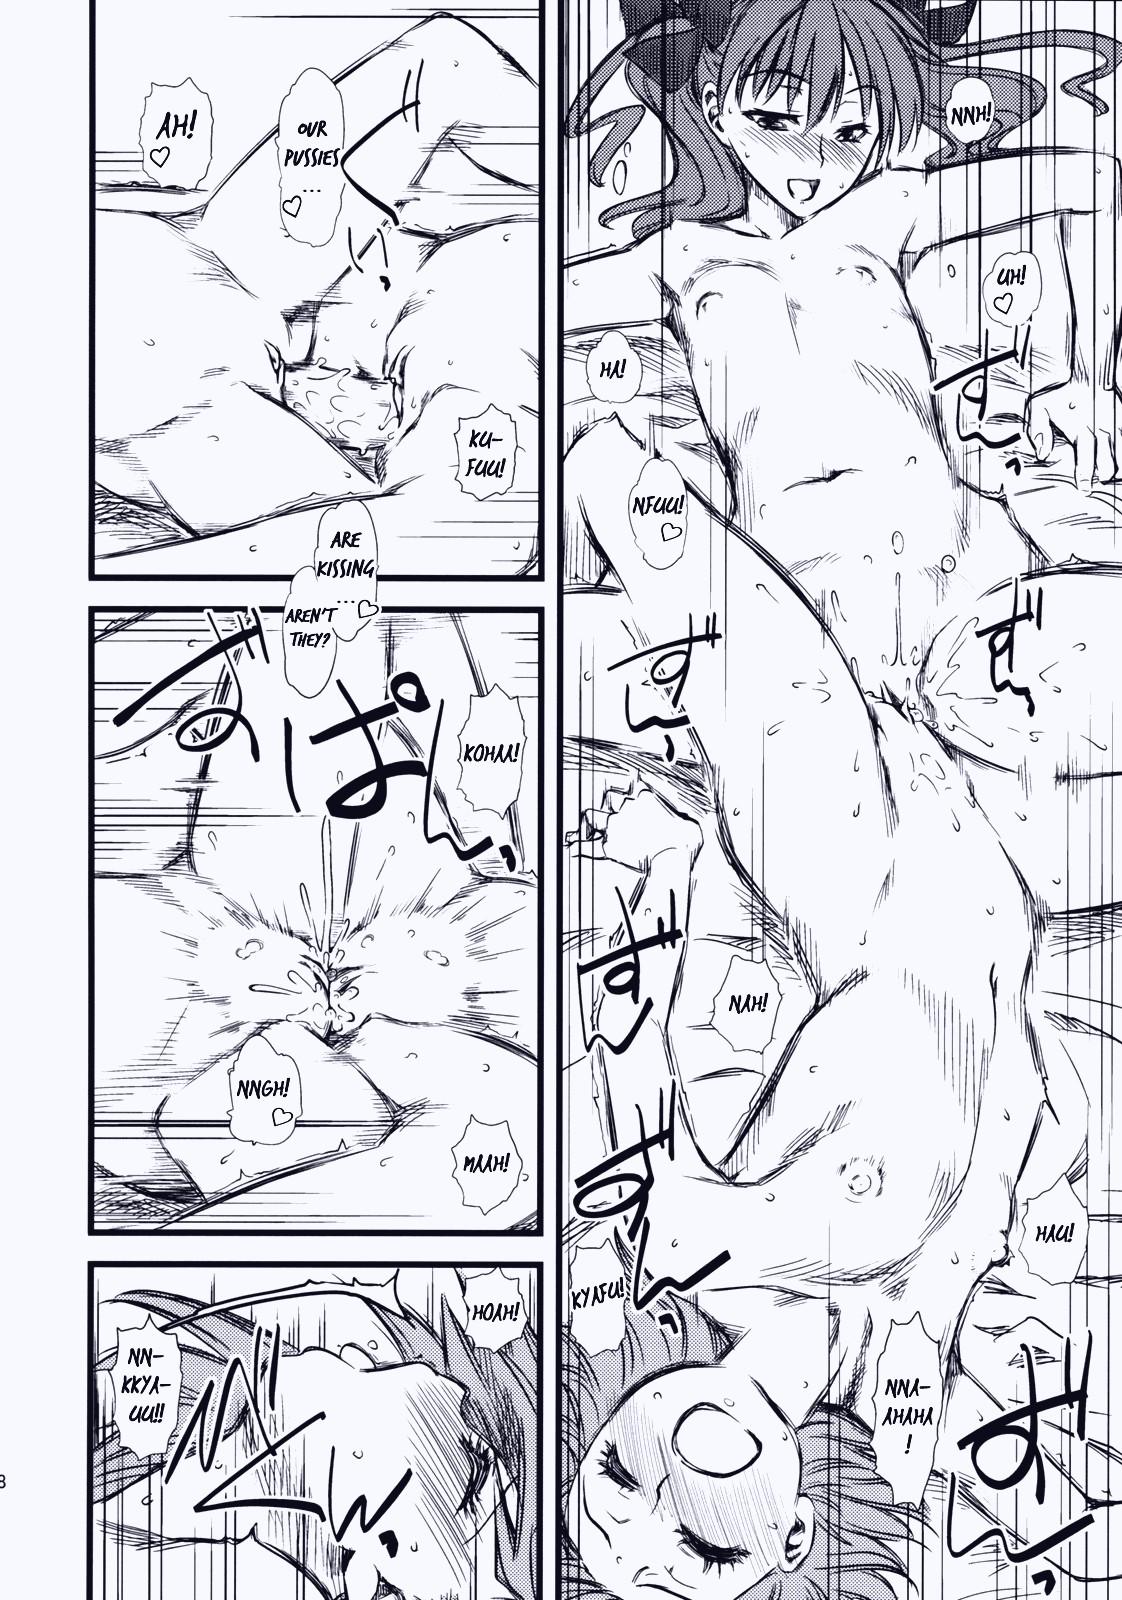 Oneesama! Oneesama! page 35